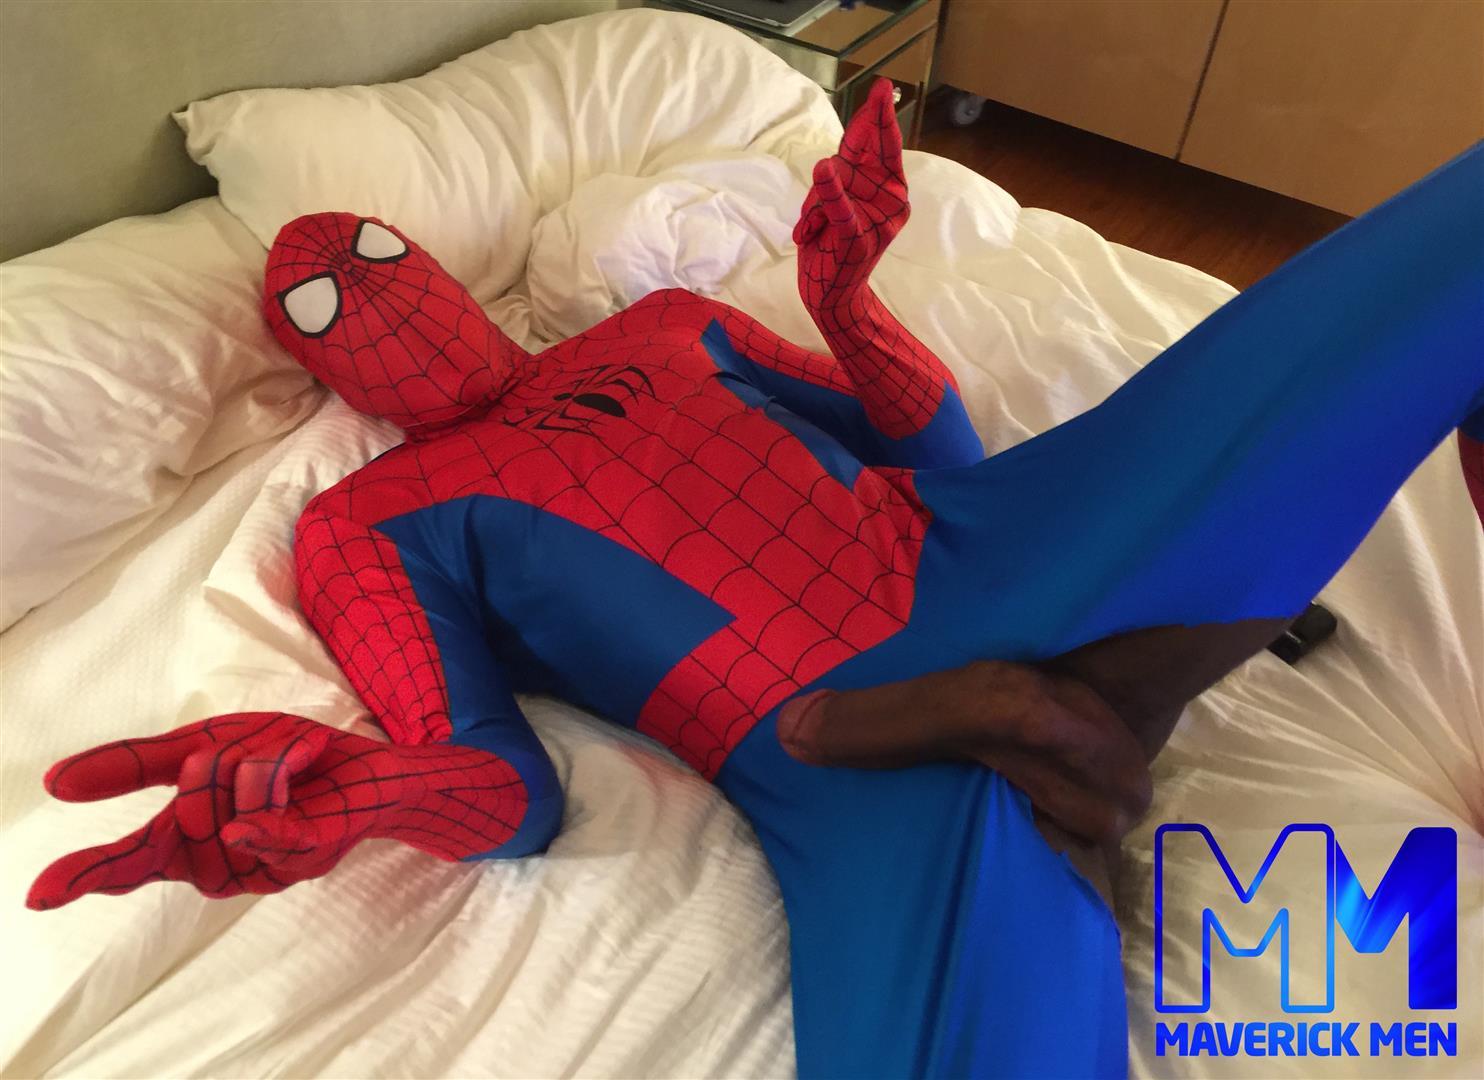 Maverick-Men-Spiderman-With-A-Big-Black-Dick-Bareback-Threesome-Amateur-Gay-Porn-01 Happy Halloween... Did You Know That Spiderman Has A Big Black Dick?